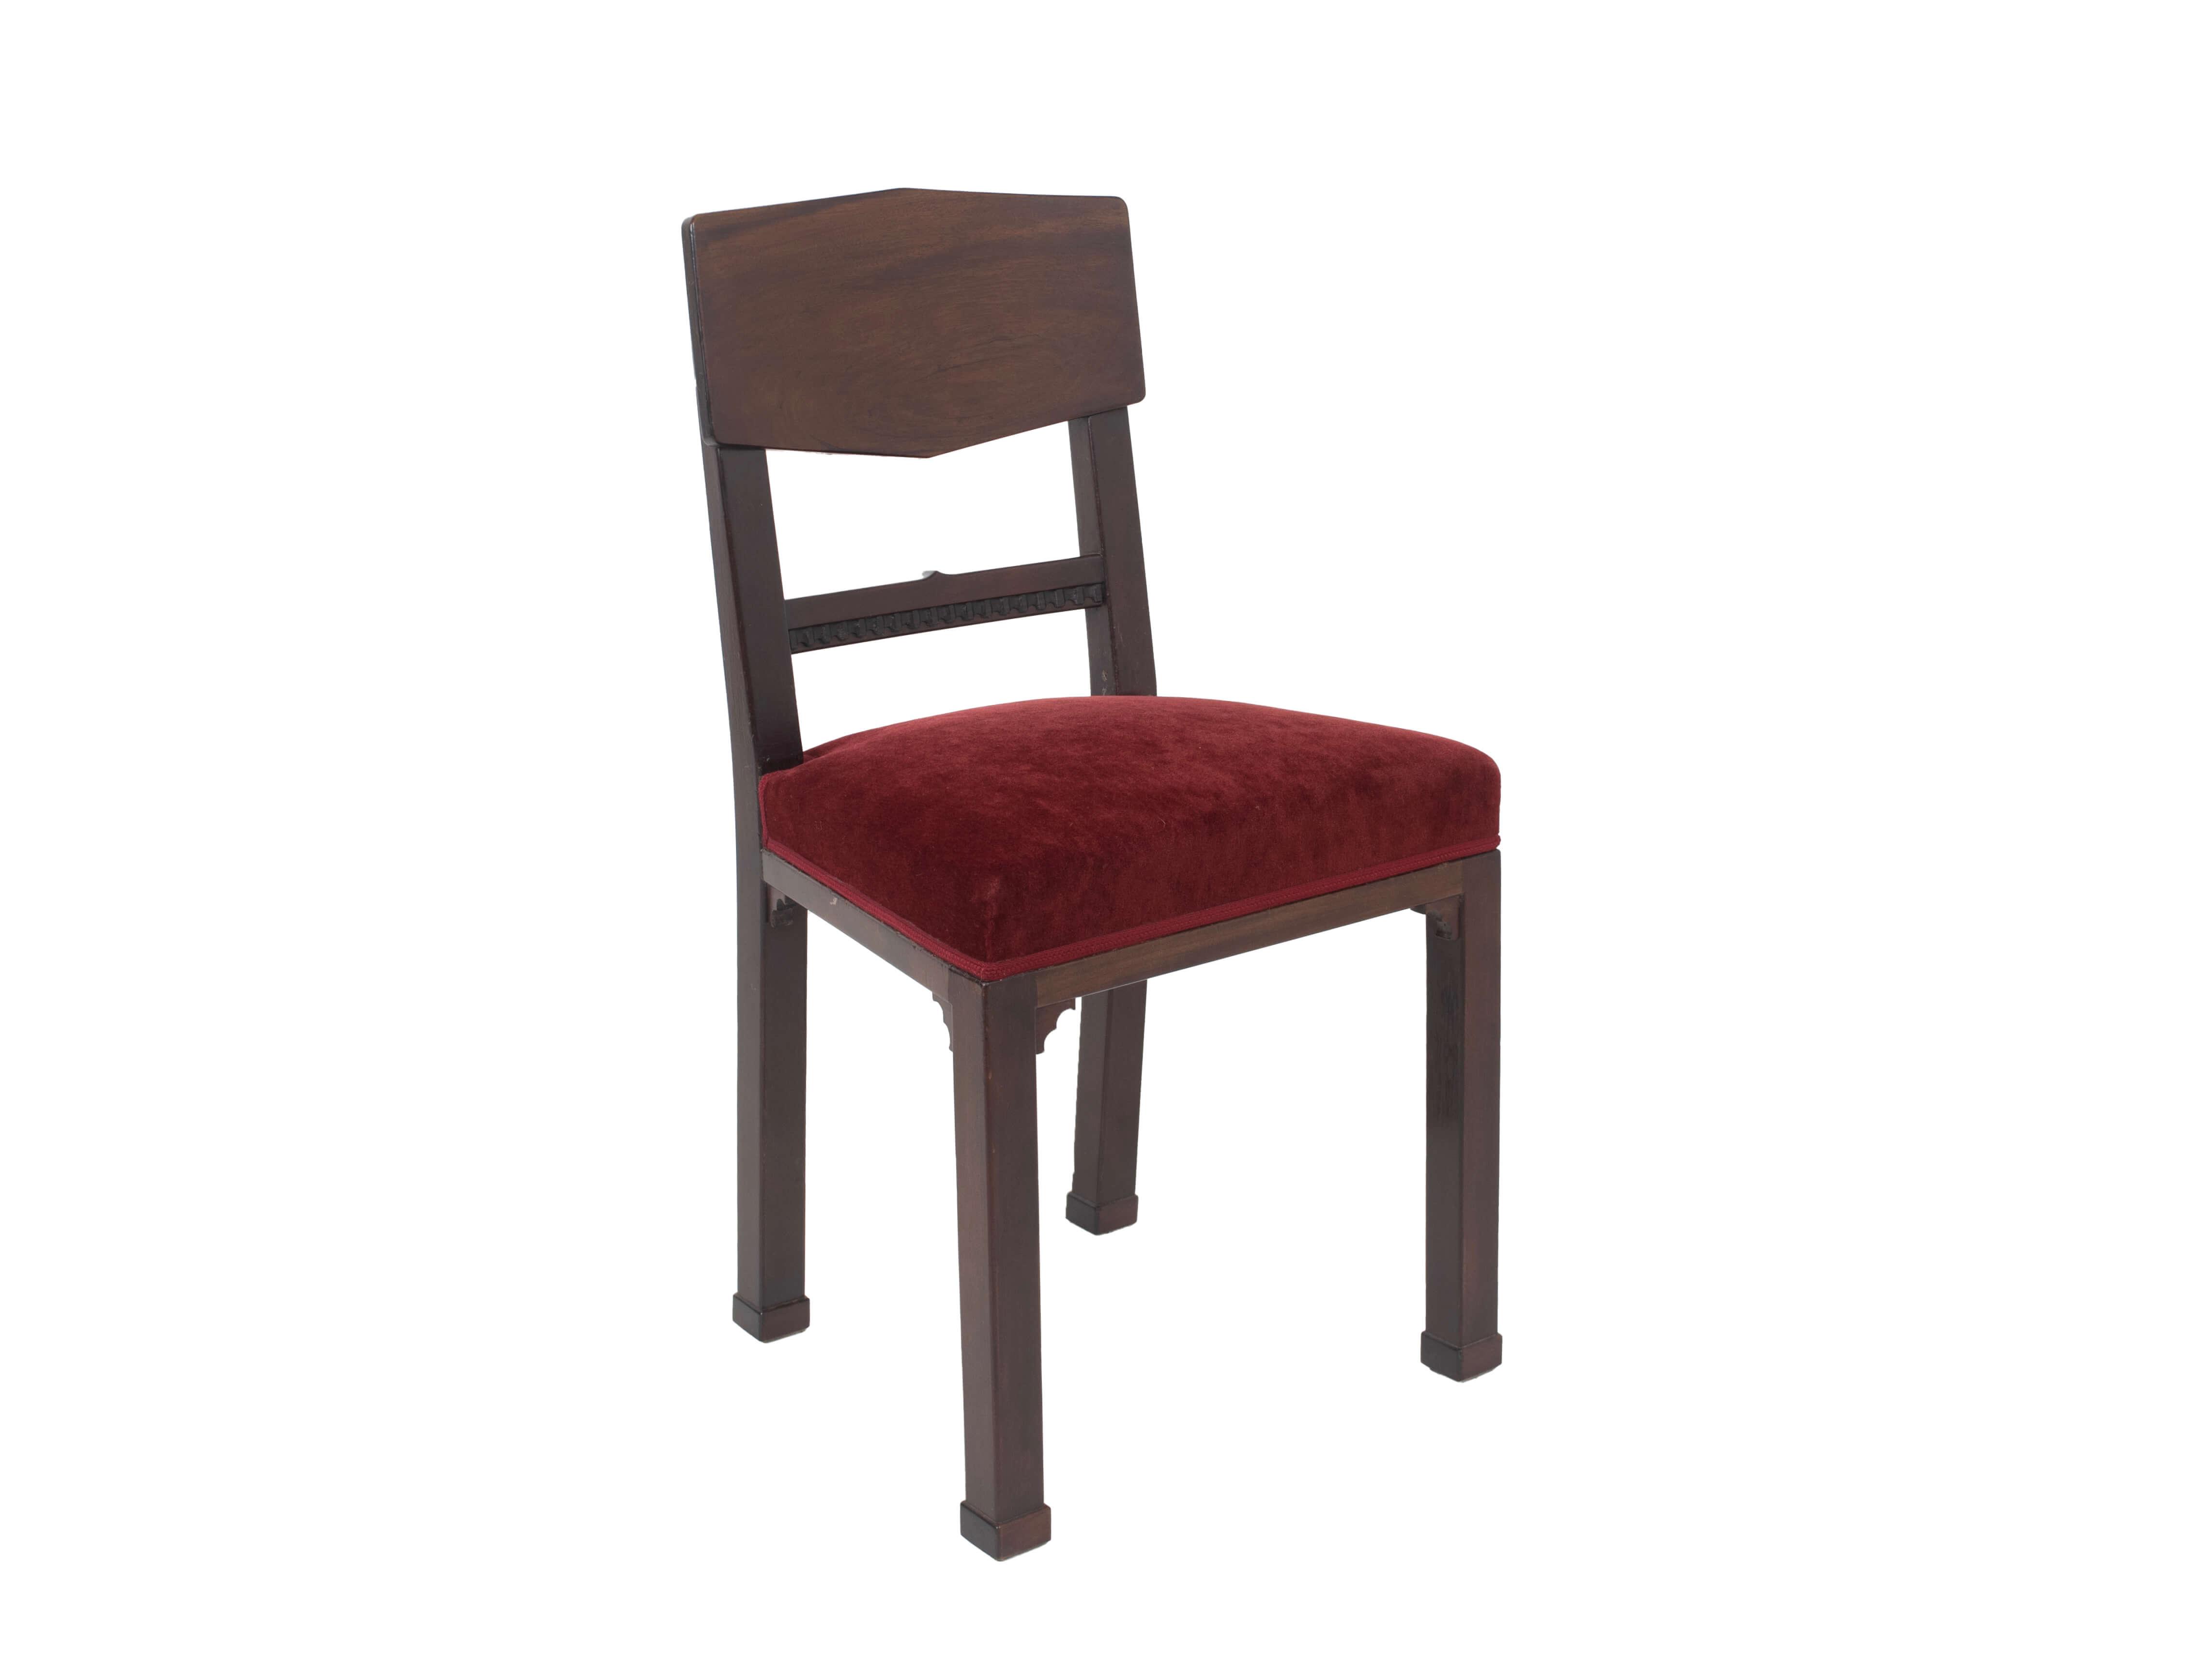 Amsterdam School Chair in Mahogany